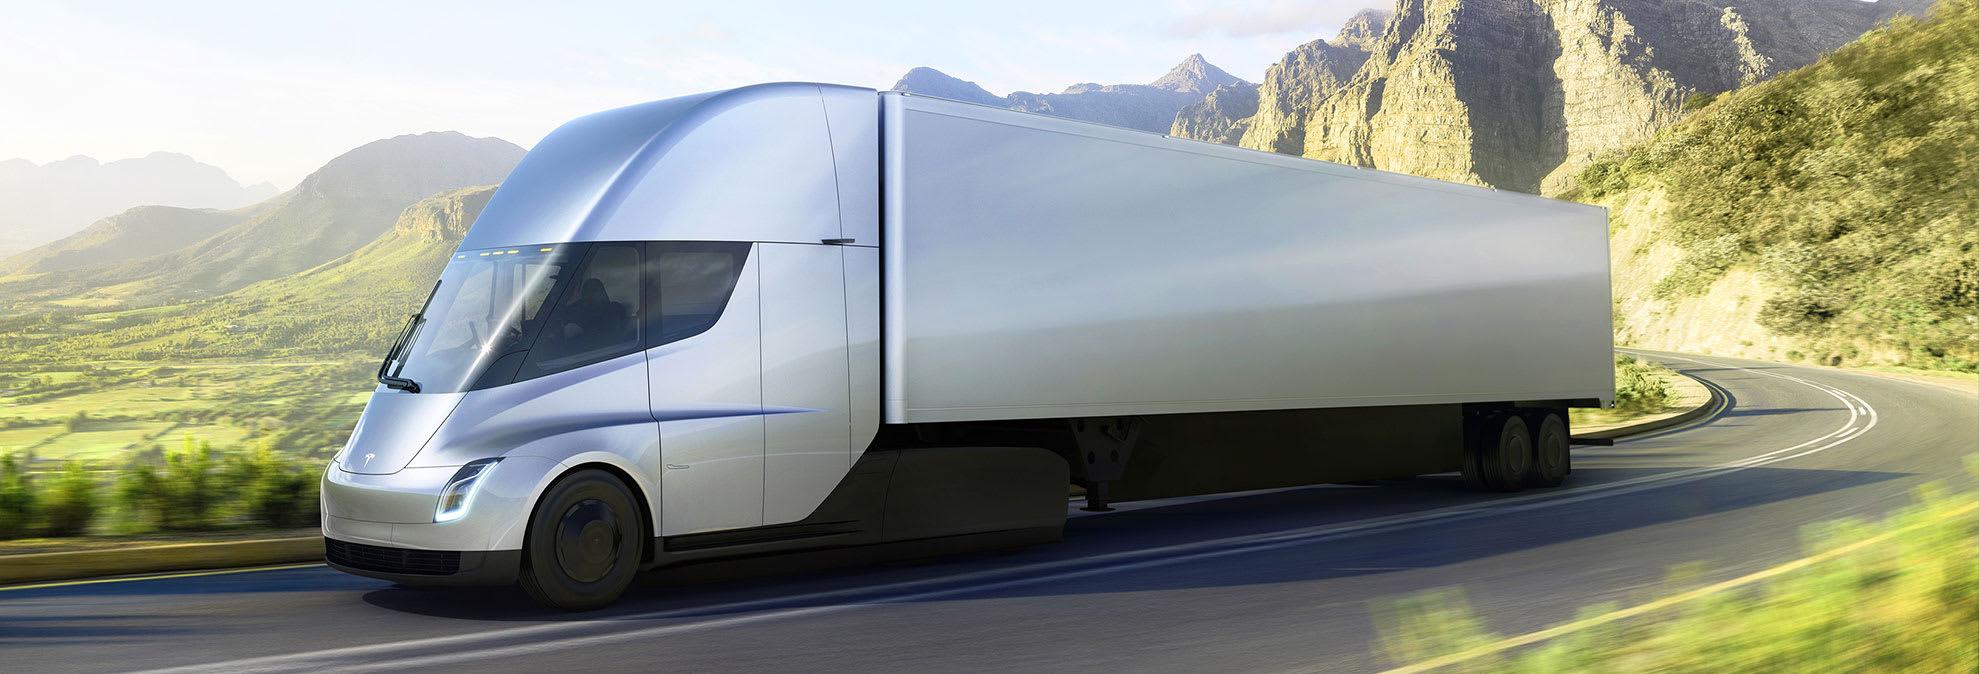 Electric Tesla Semi Truck Consumer Reports